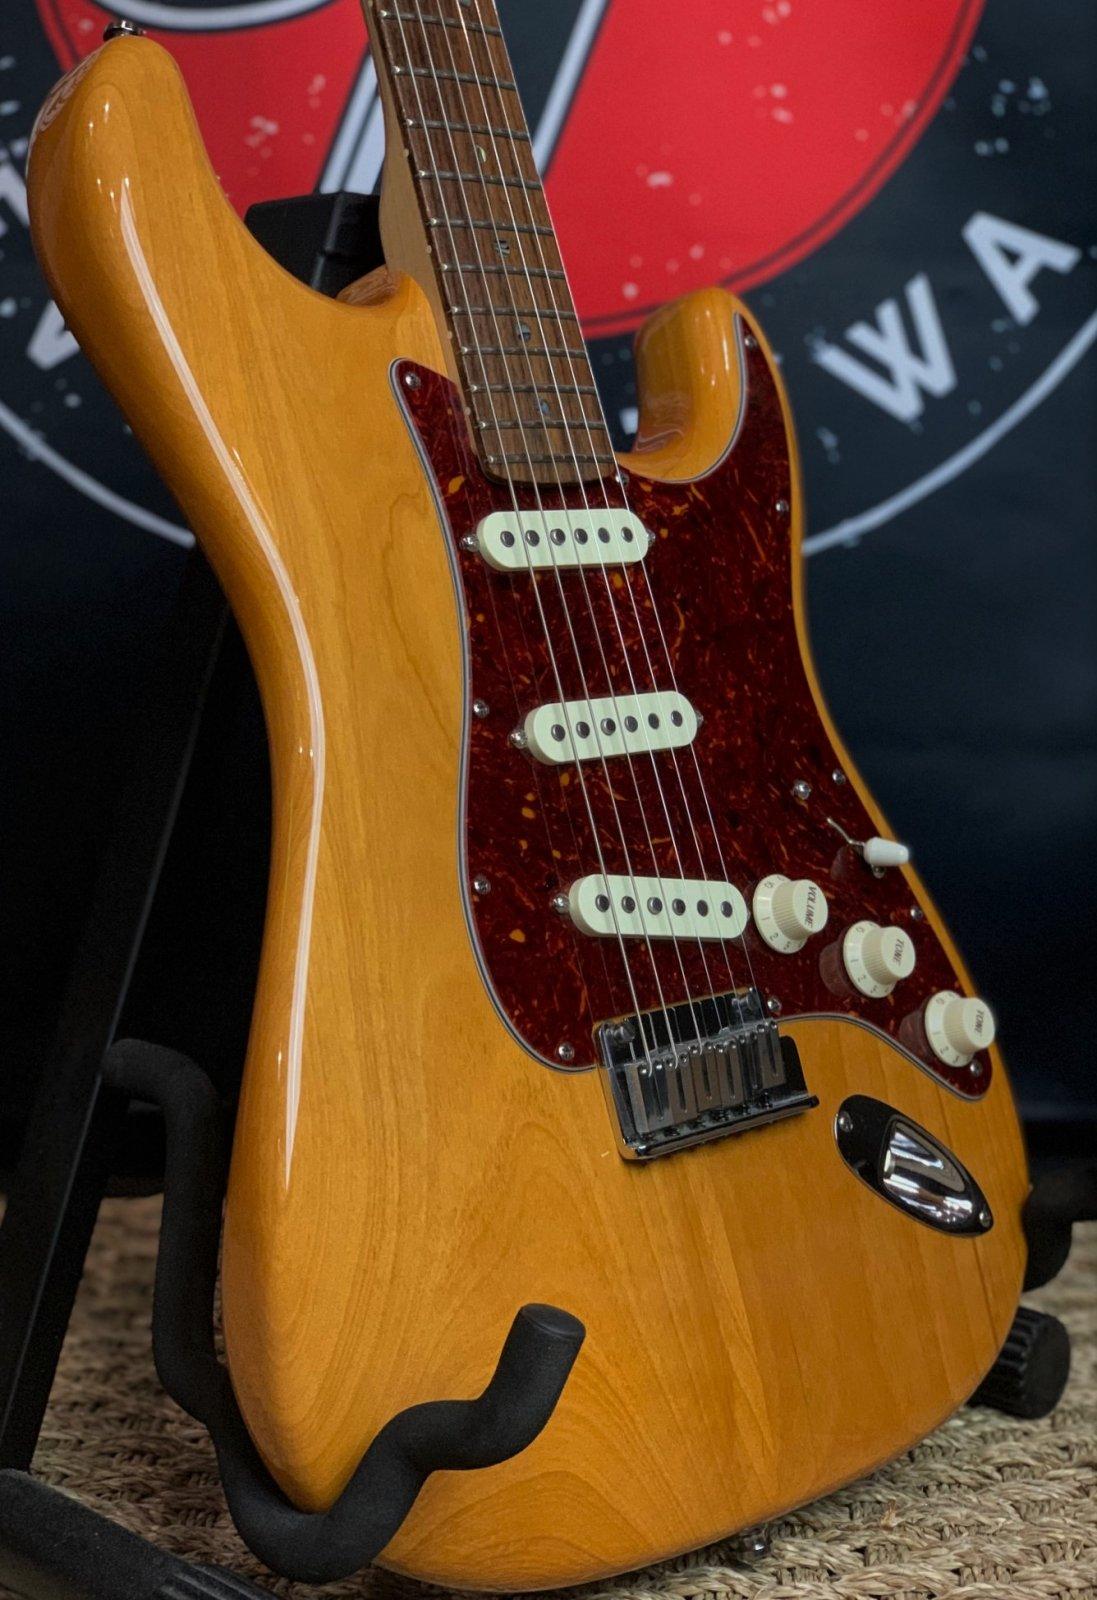 2007 Fender American Deluxe Stratocaster w/OHC